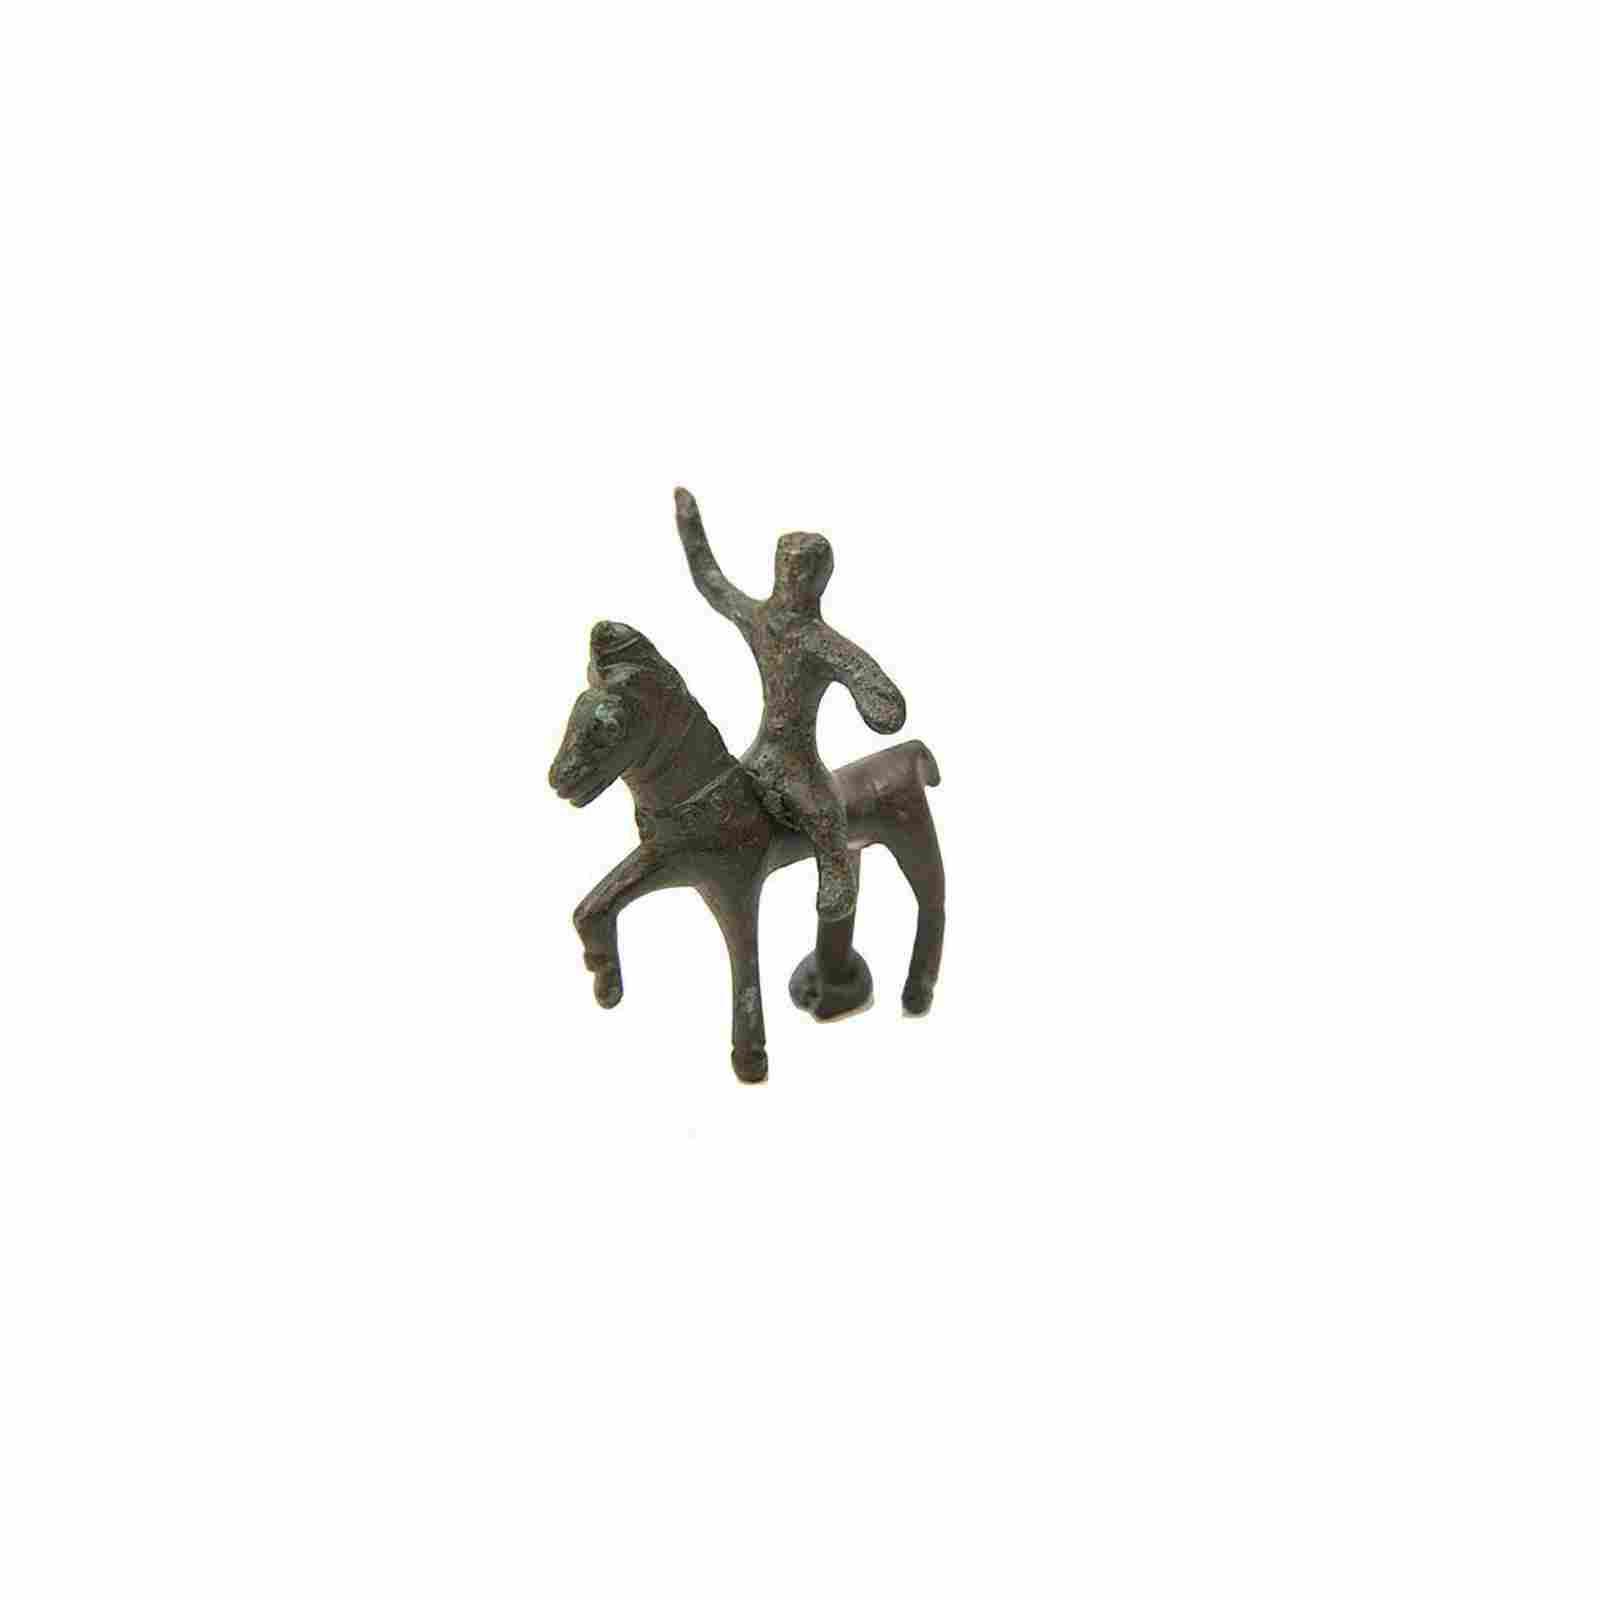 Ancient Roman Bronze Horse and Rider c.2nd century AD.